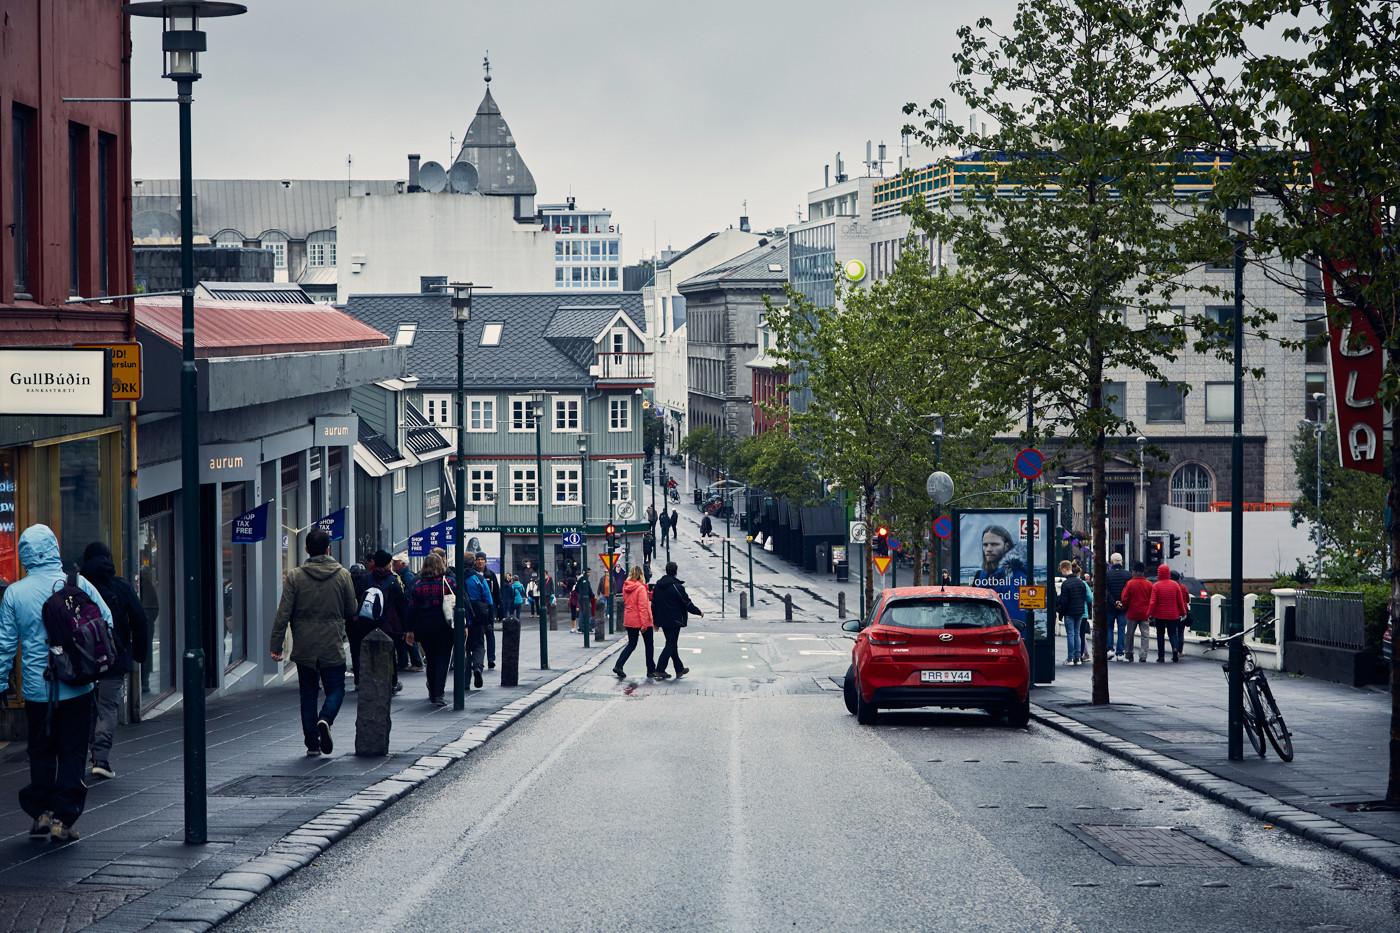 Reykjavik, Iceland, Island, things to do, rainy day, Regentag, Städtetrip, Roadtrip, Reiseblog, travelblog, where to park, wo parken, Miles and Shores, travelblogger, nassester Sommer, Regenzeit, Klimawandel